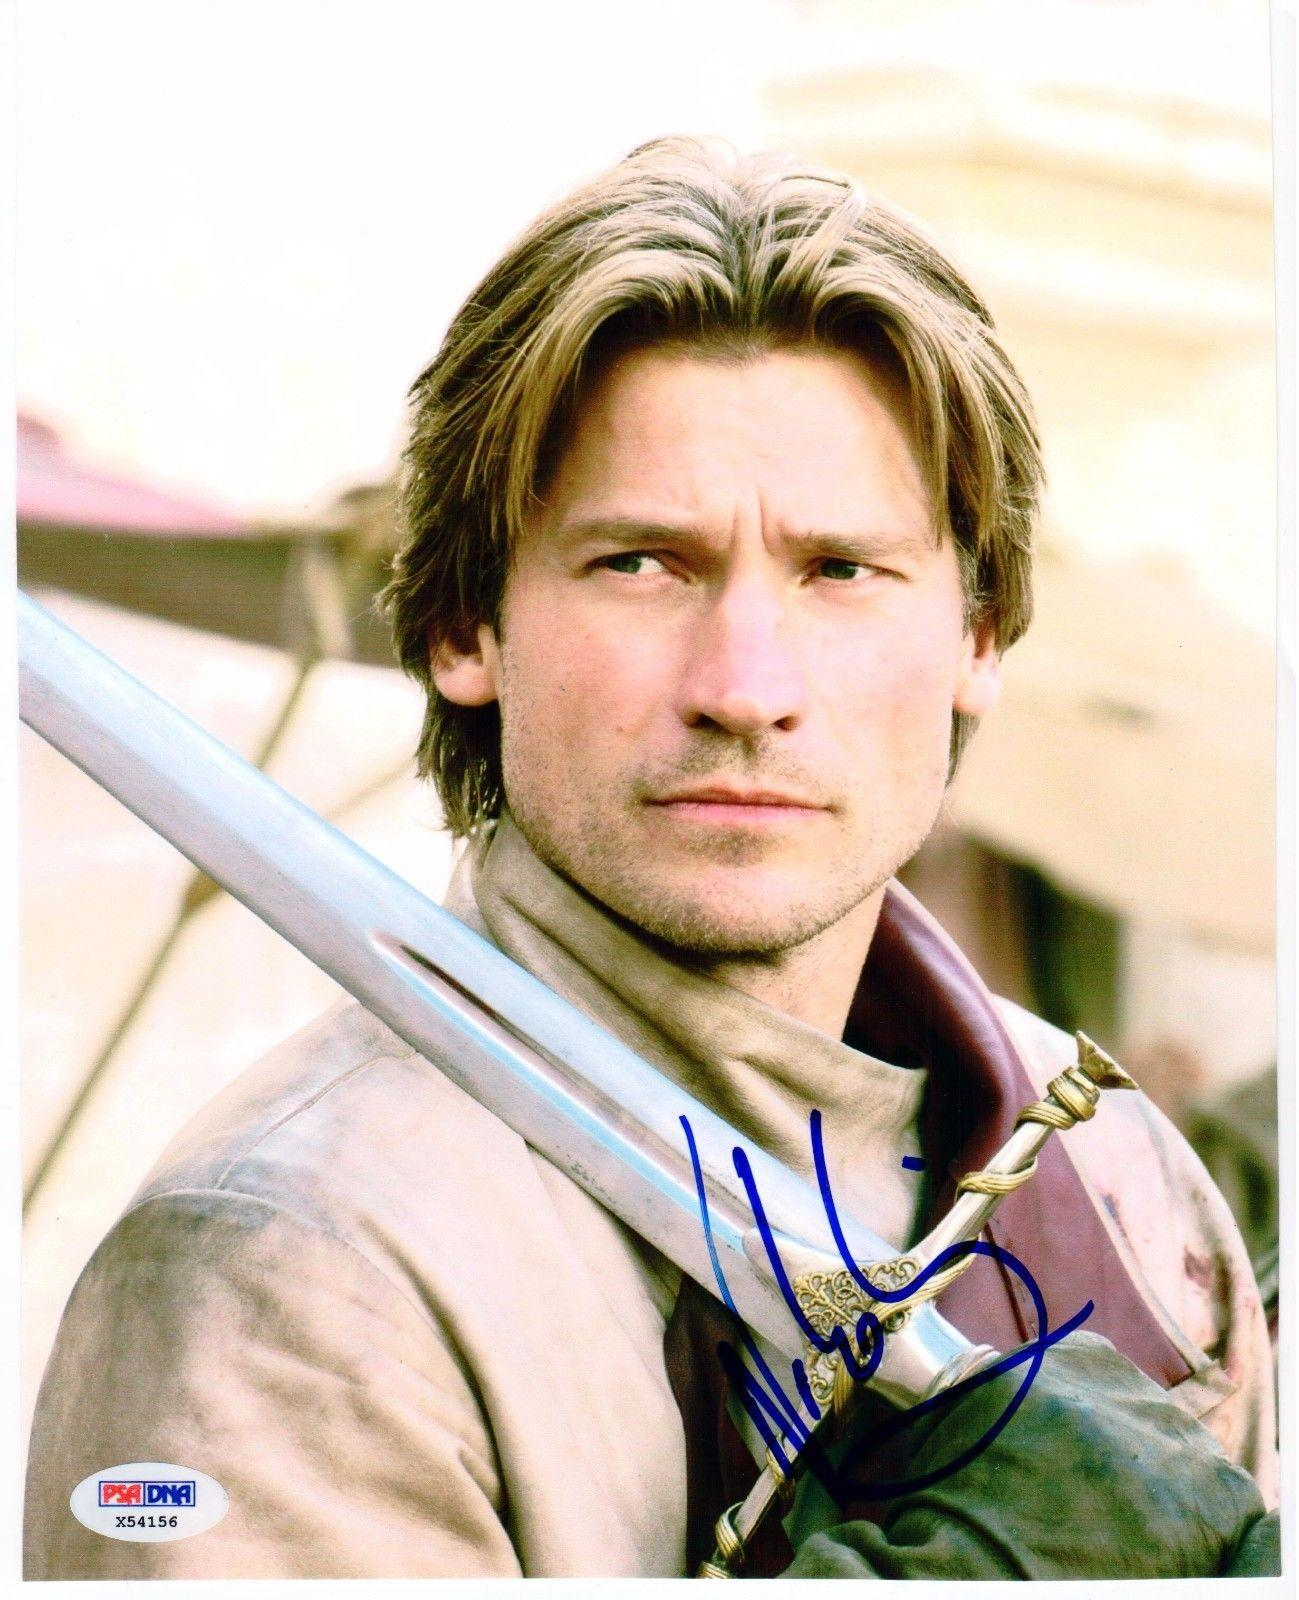 Nikolaj Coster-Waldau Jamie Lannister signed 8x10 photo PSA/DNA Game of Thrones